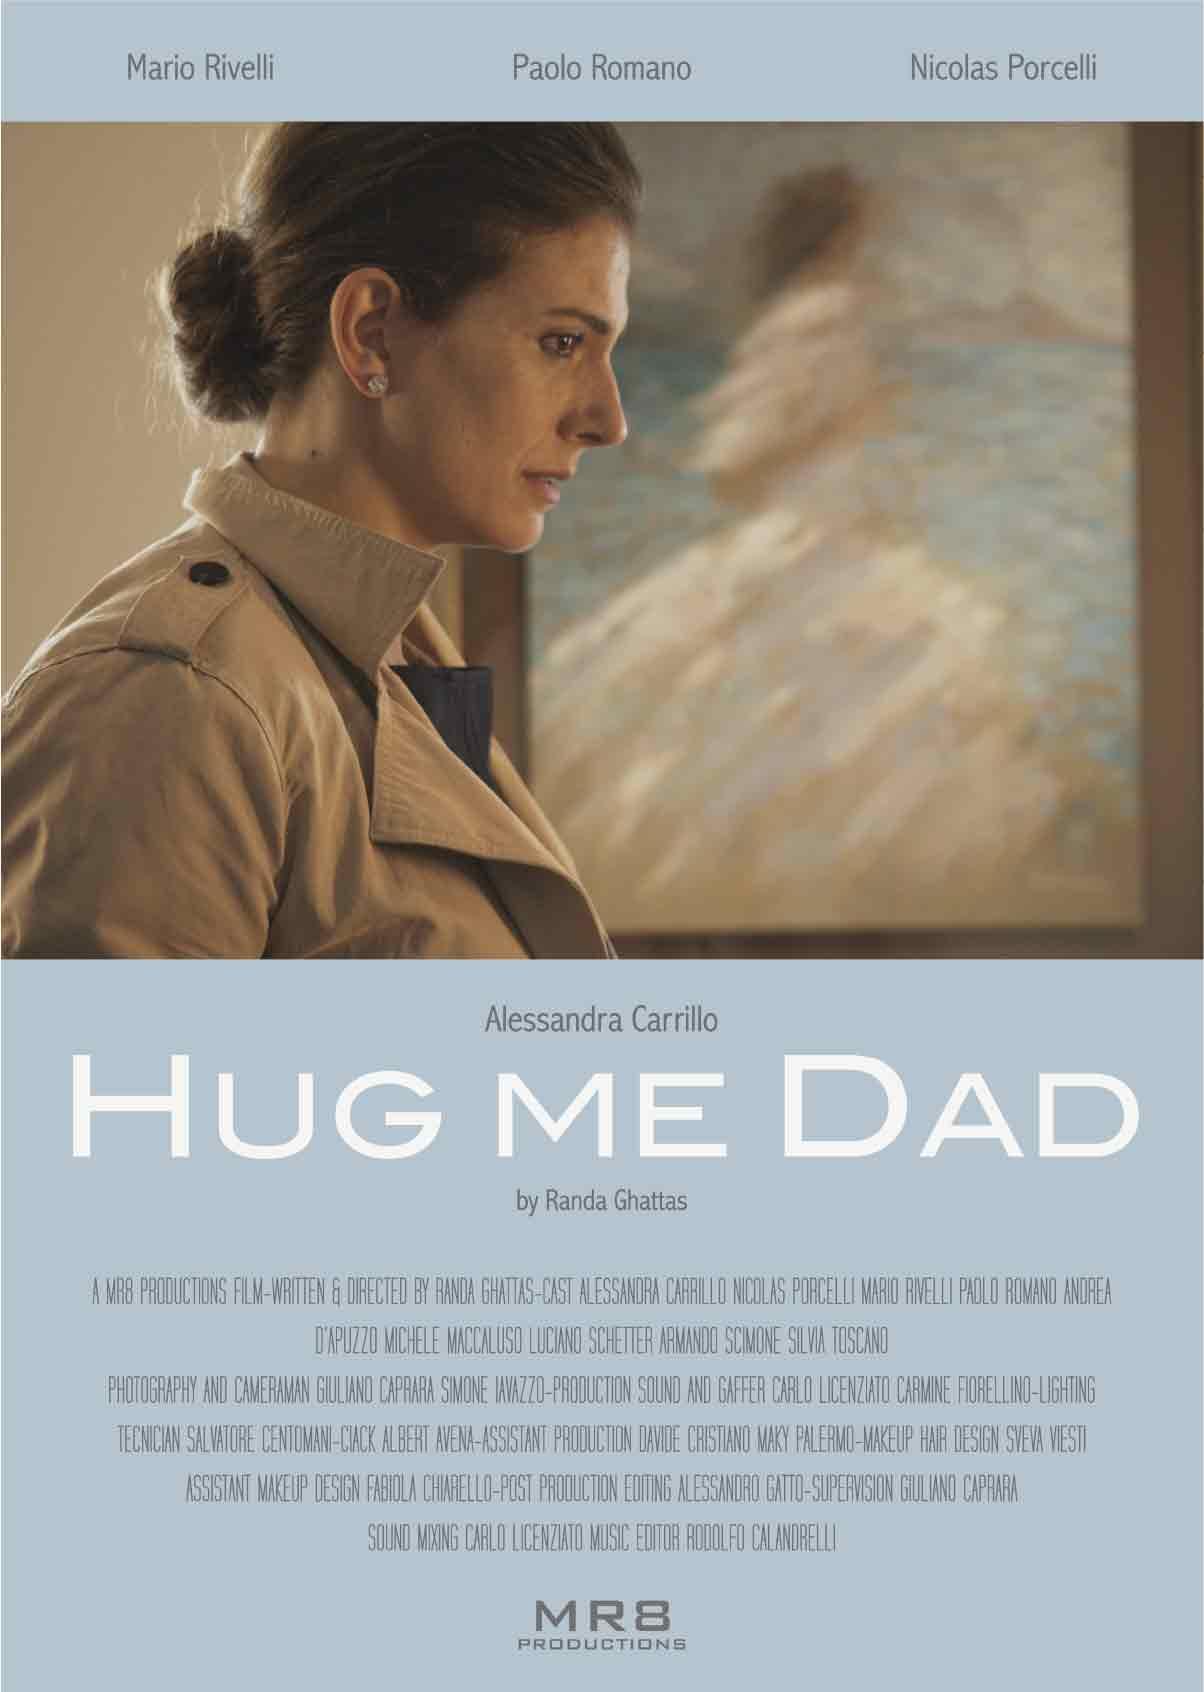 Hug me dad poster MR8 Productions